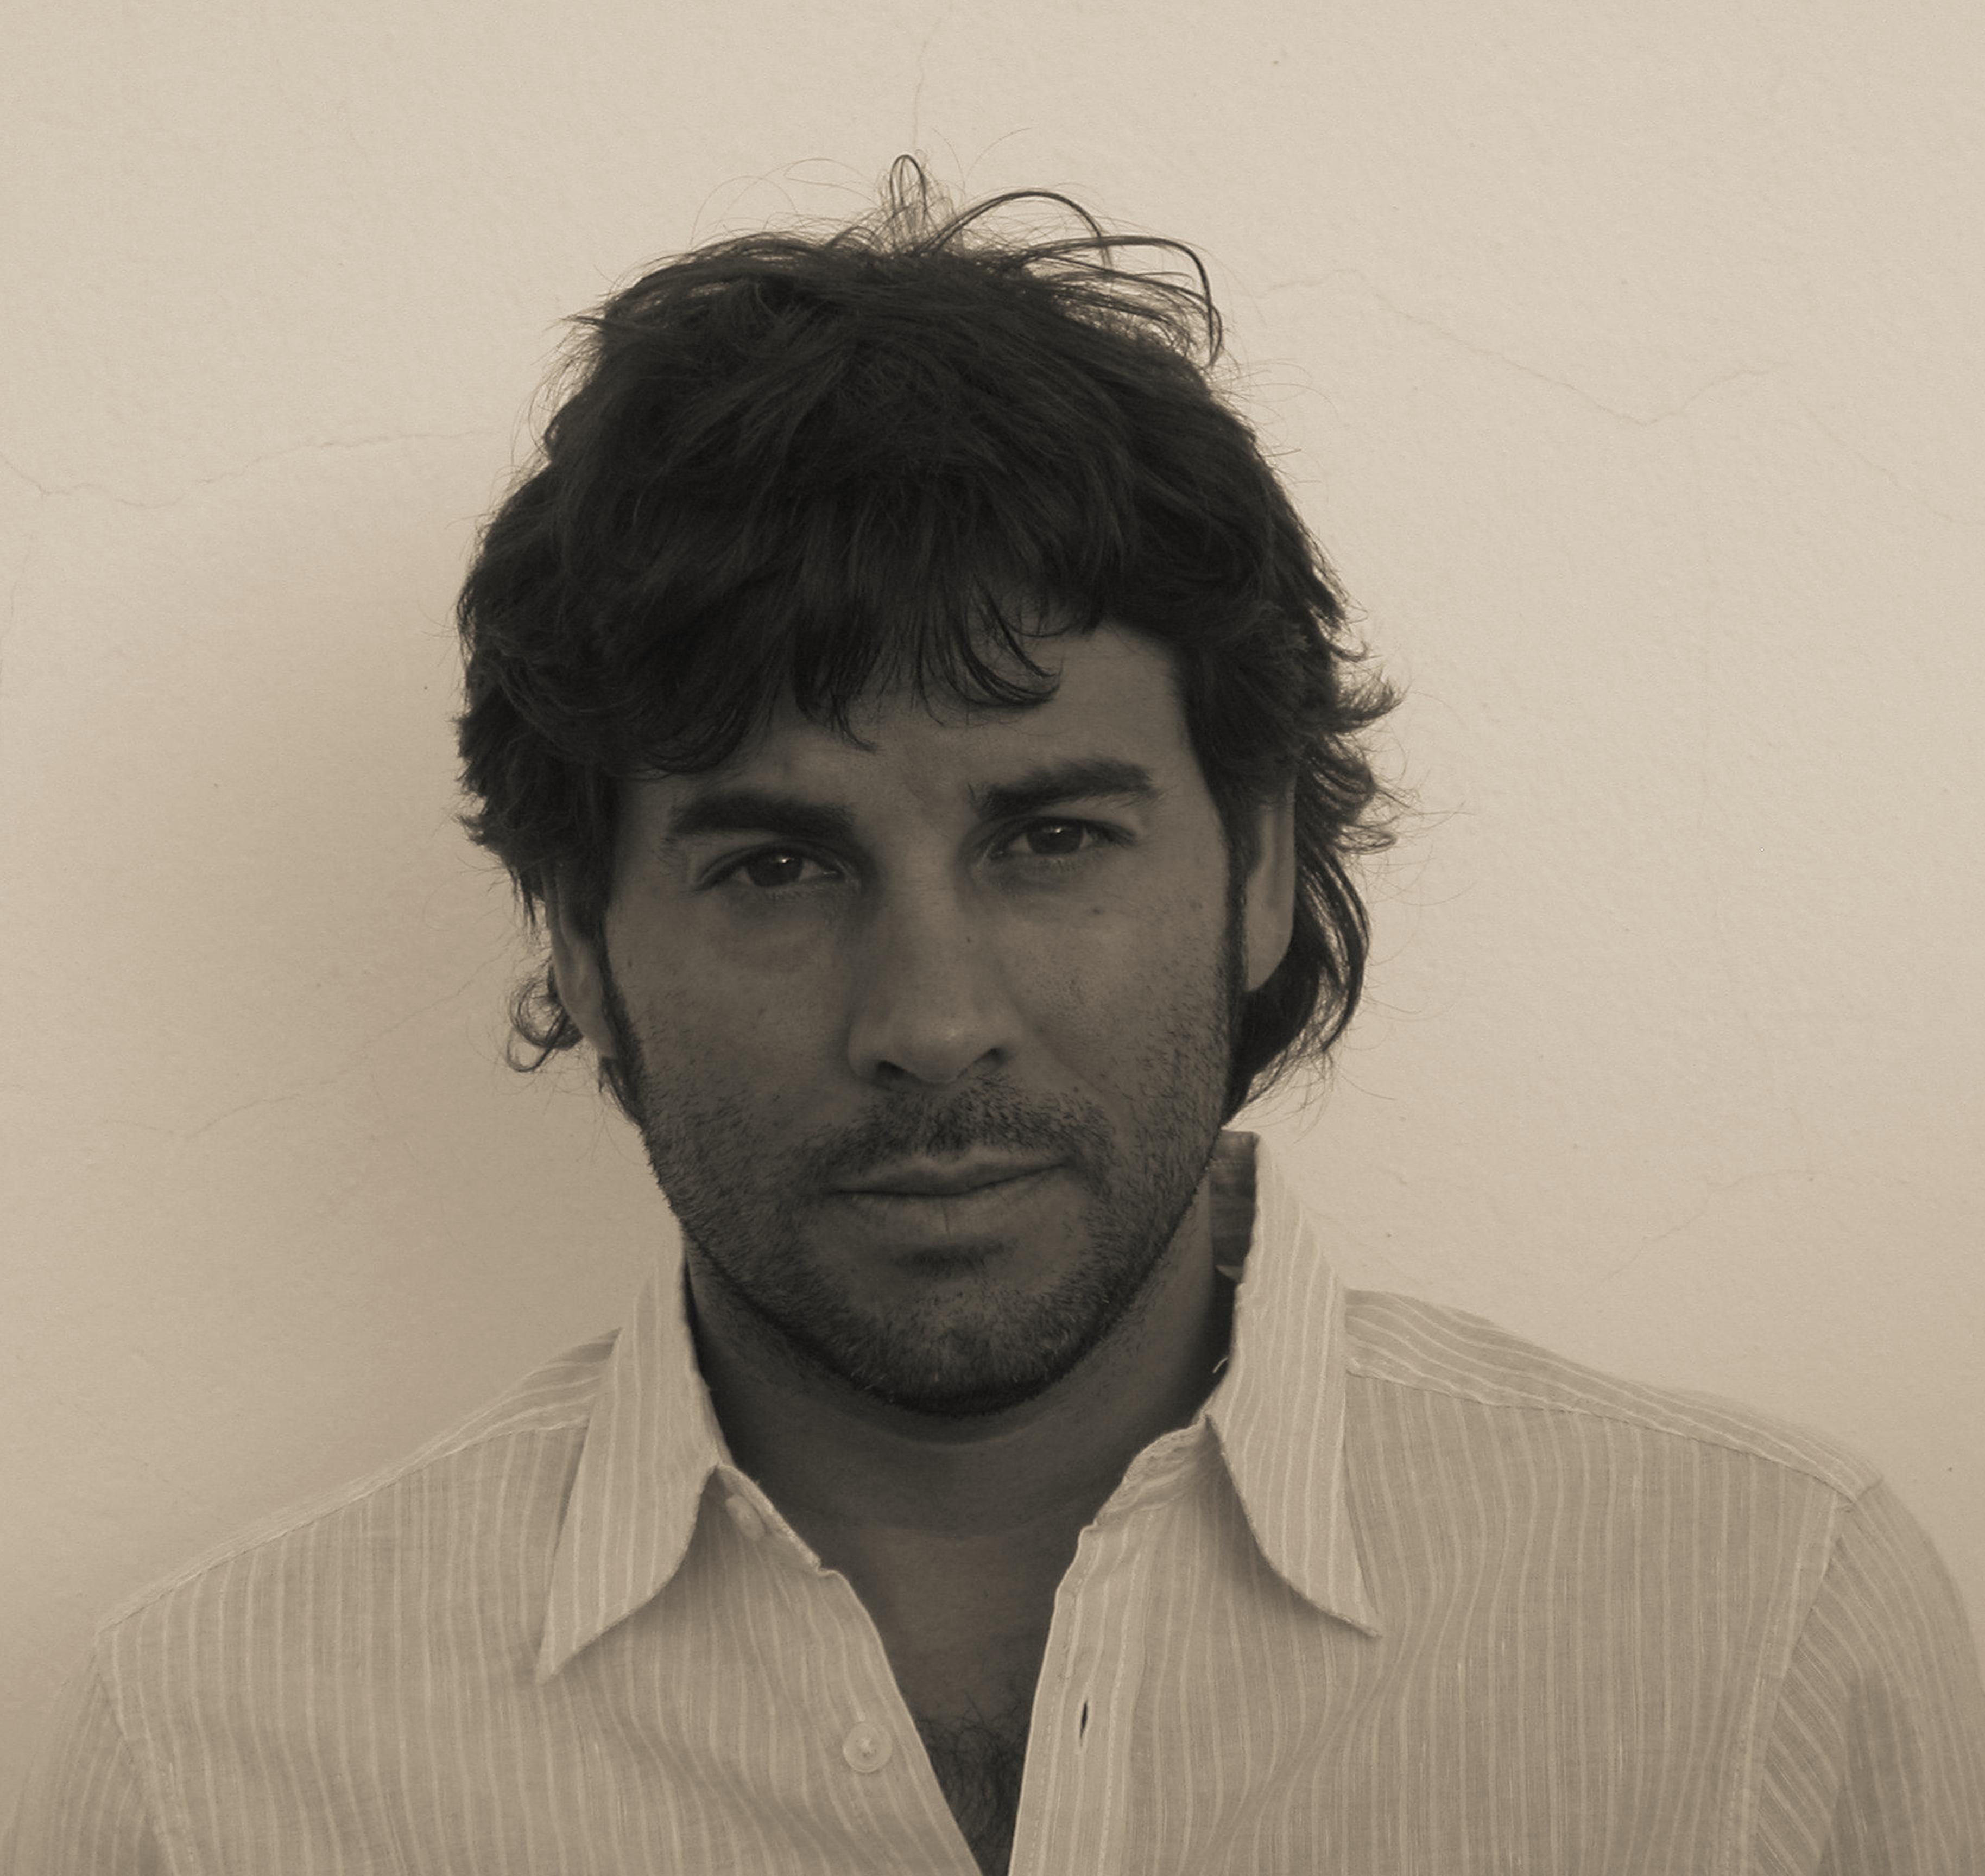 Jorge David Fernández Gómez